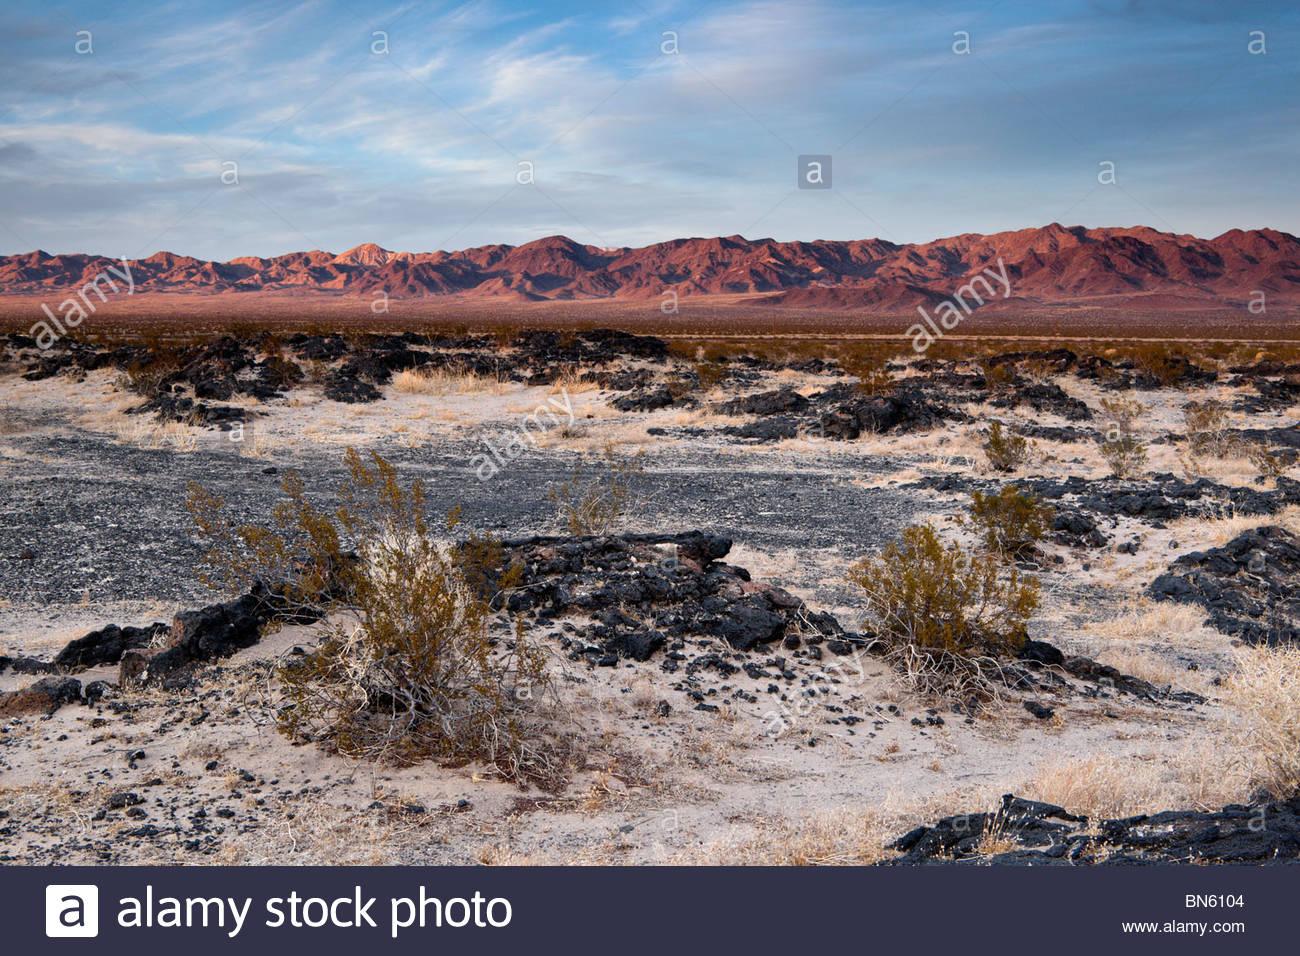 Lava Field in Mojave Desert, Amboy Crater National Natural Landmark, California - Stock Image